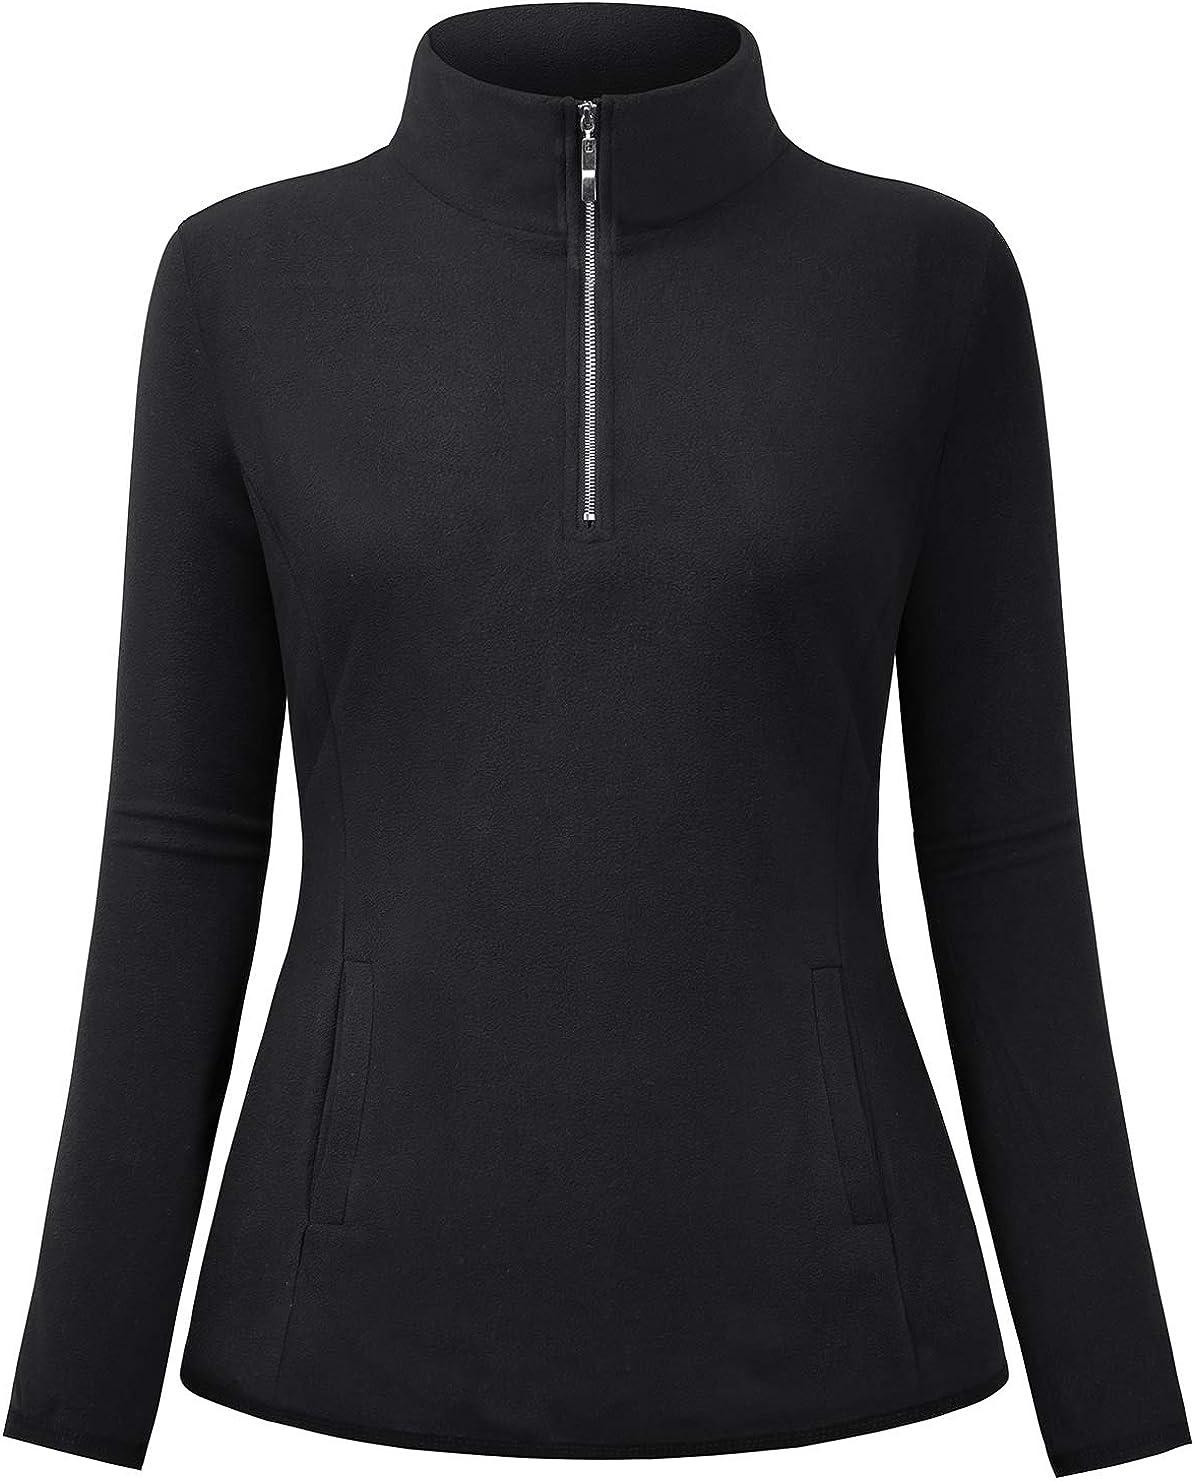 NEWMEEN Womens 1/4 Zip Lightweight Polar Fleece Pullover Sweatshirt with Pockets